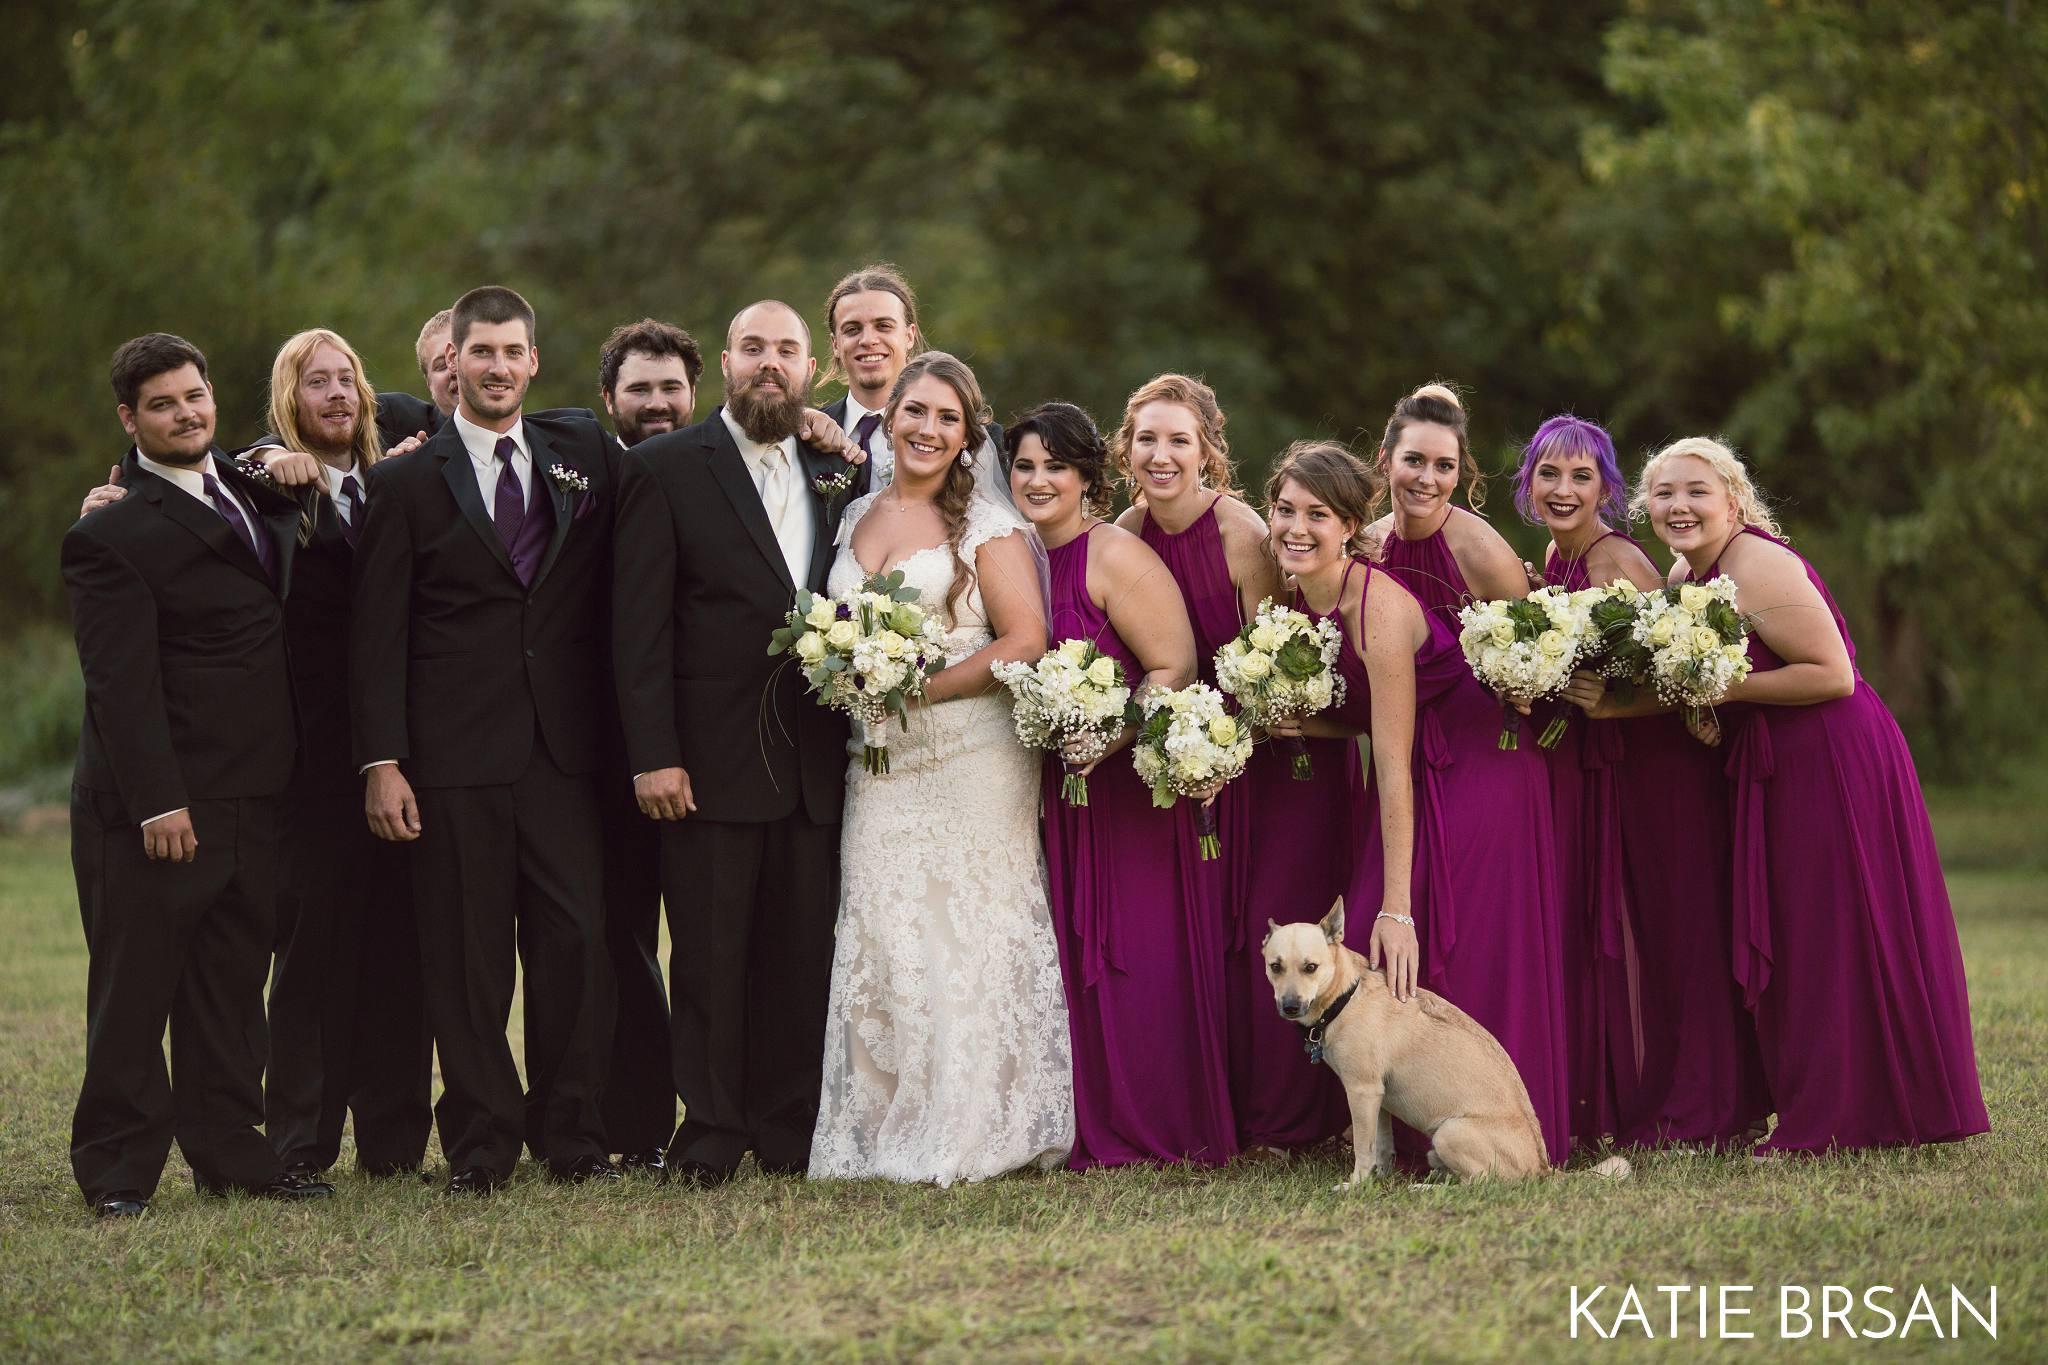 KatieBrsan-Bonfield-Backyard-Wedding_0413.jpg